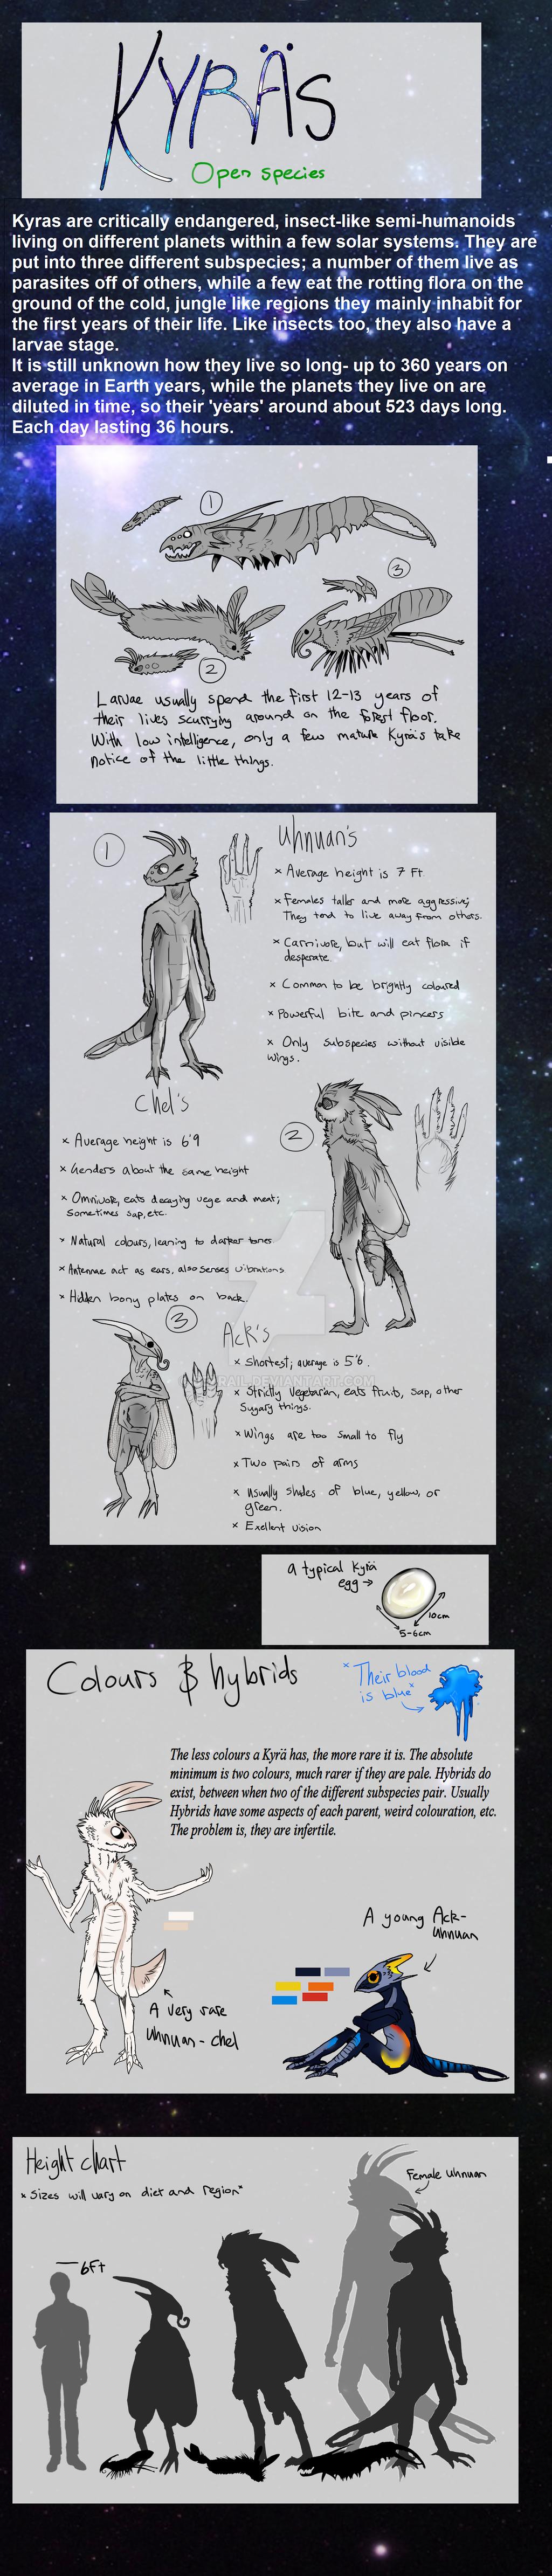 Kyra species - Updated! (Open species) by Bezrail